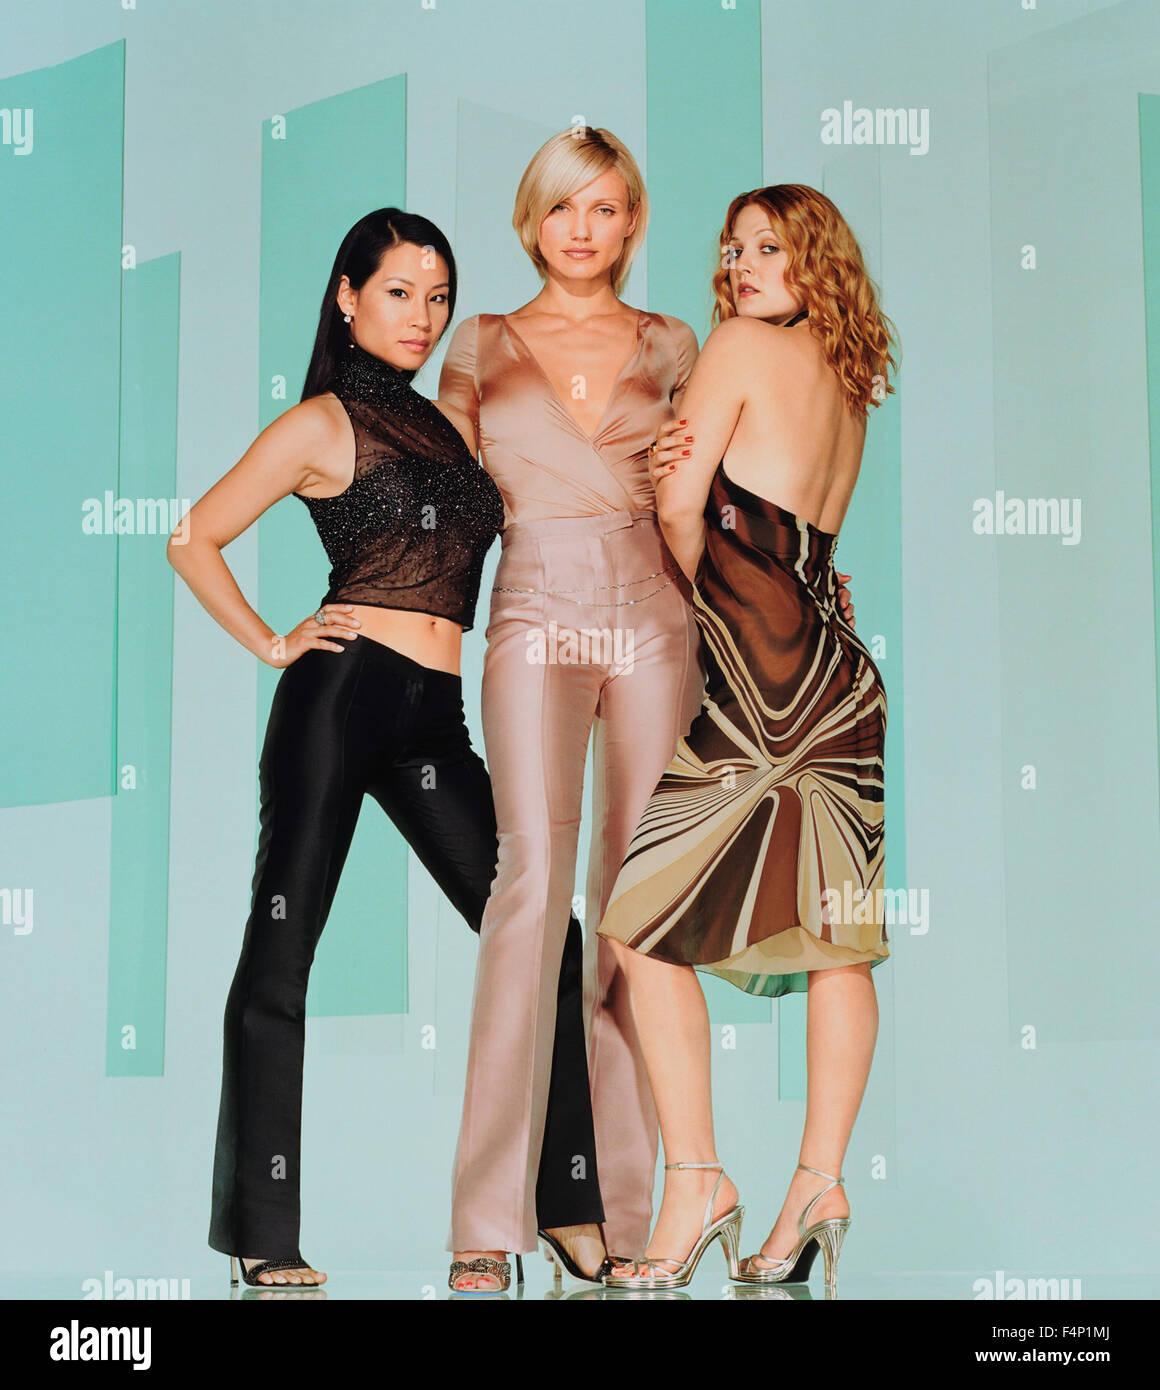 Drew Barrymore, Lucy Liu and Cameron Diaz   Charlie's angels: Les anges se dechaînent (2003)   USA  Director : McG Stock Photo